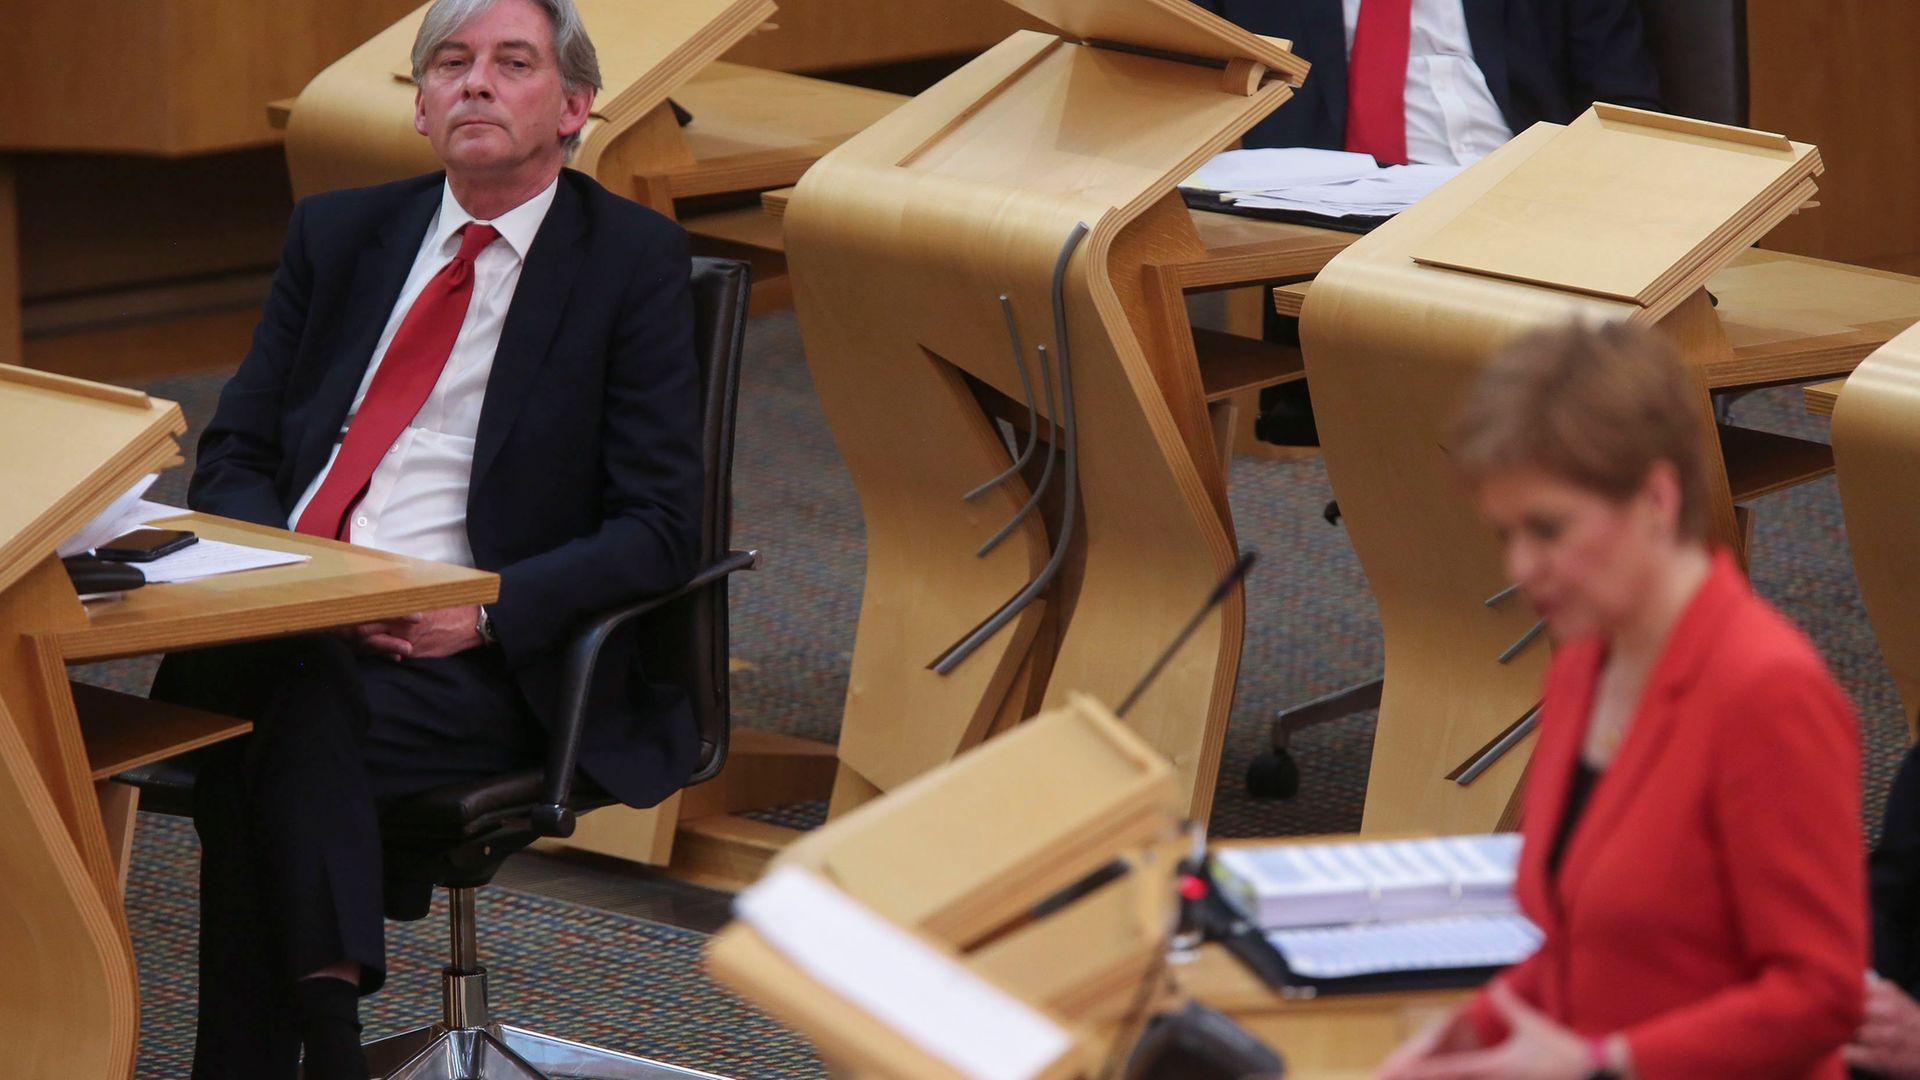 Richard Leonard MSP Scottish Labour Leader and Nicola Sturgeon MSP First Minister - Credit: Fraser Bremner-WPA Pool/Getty Images